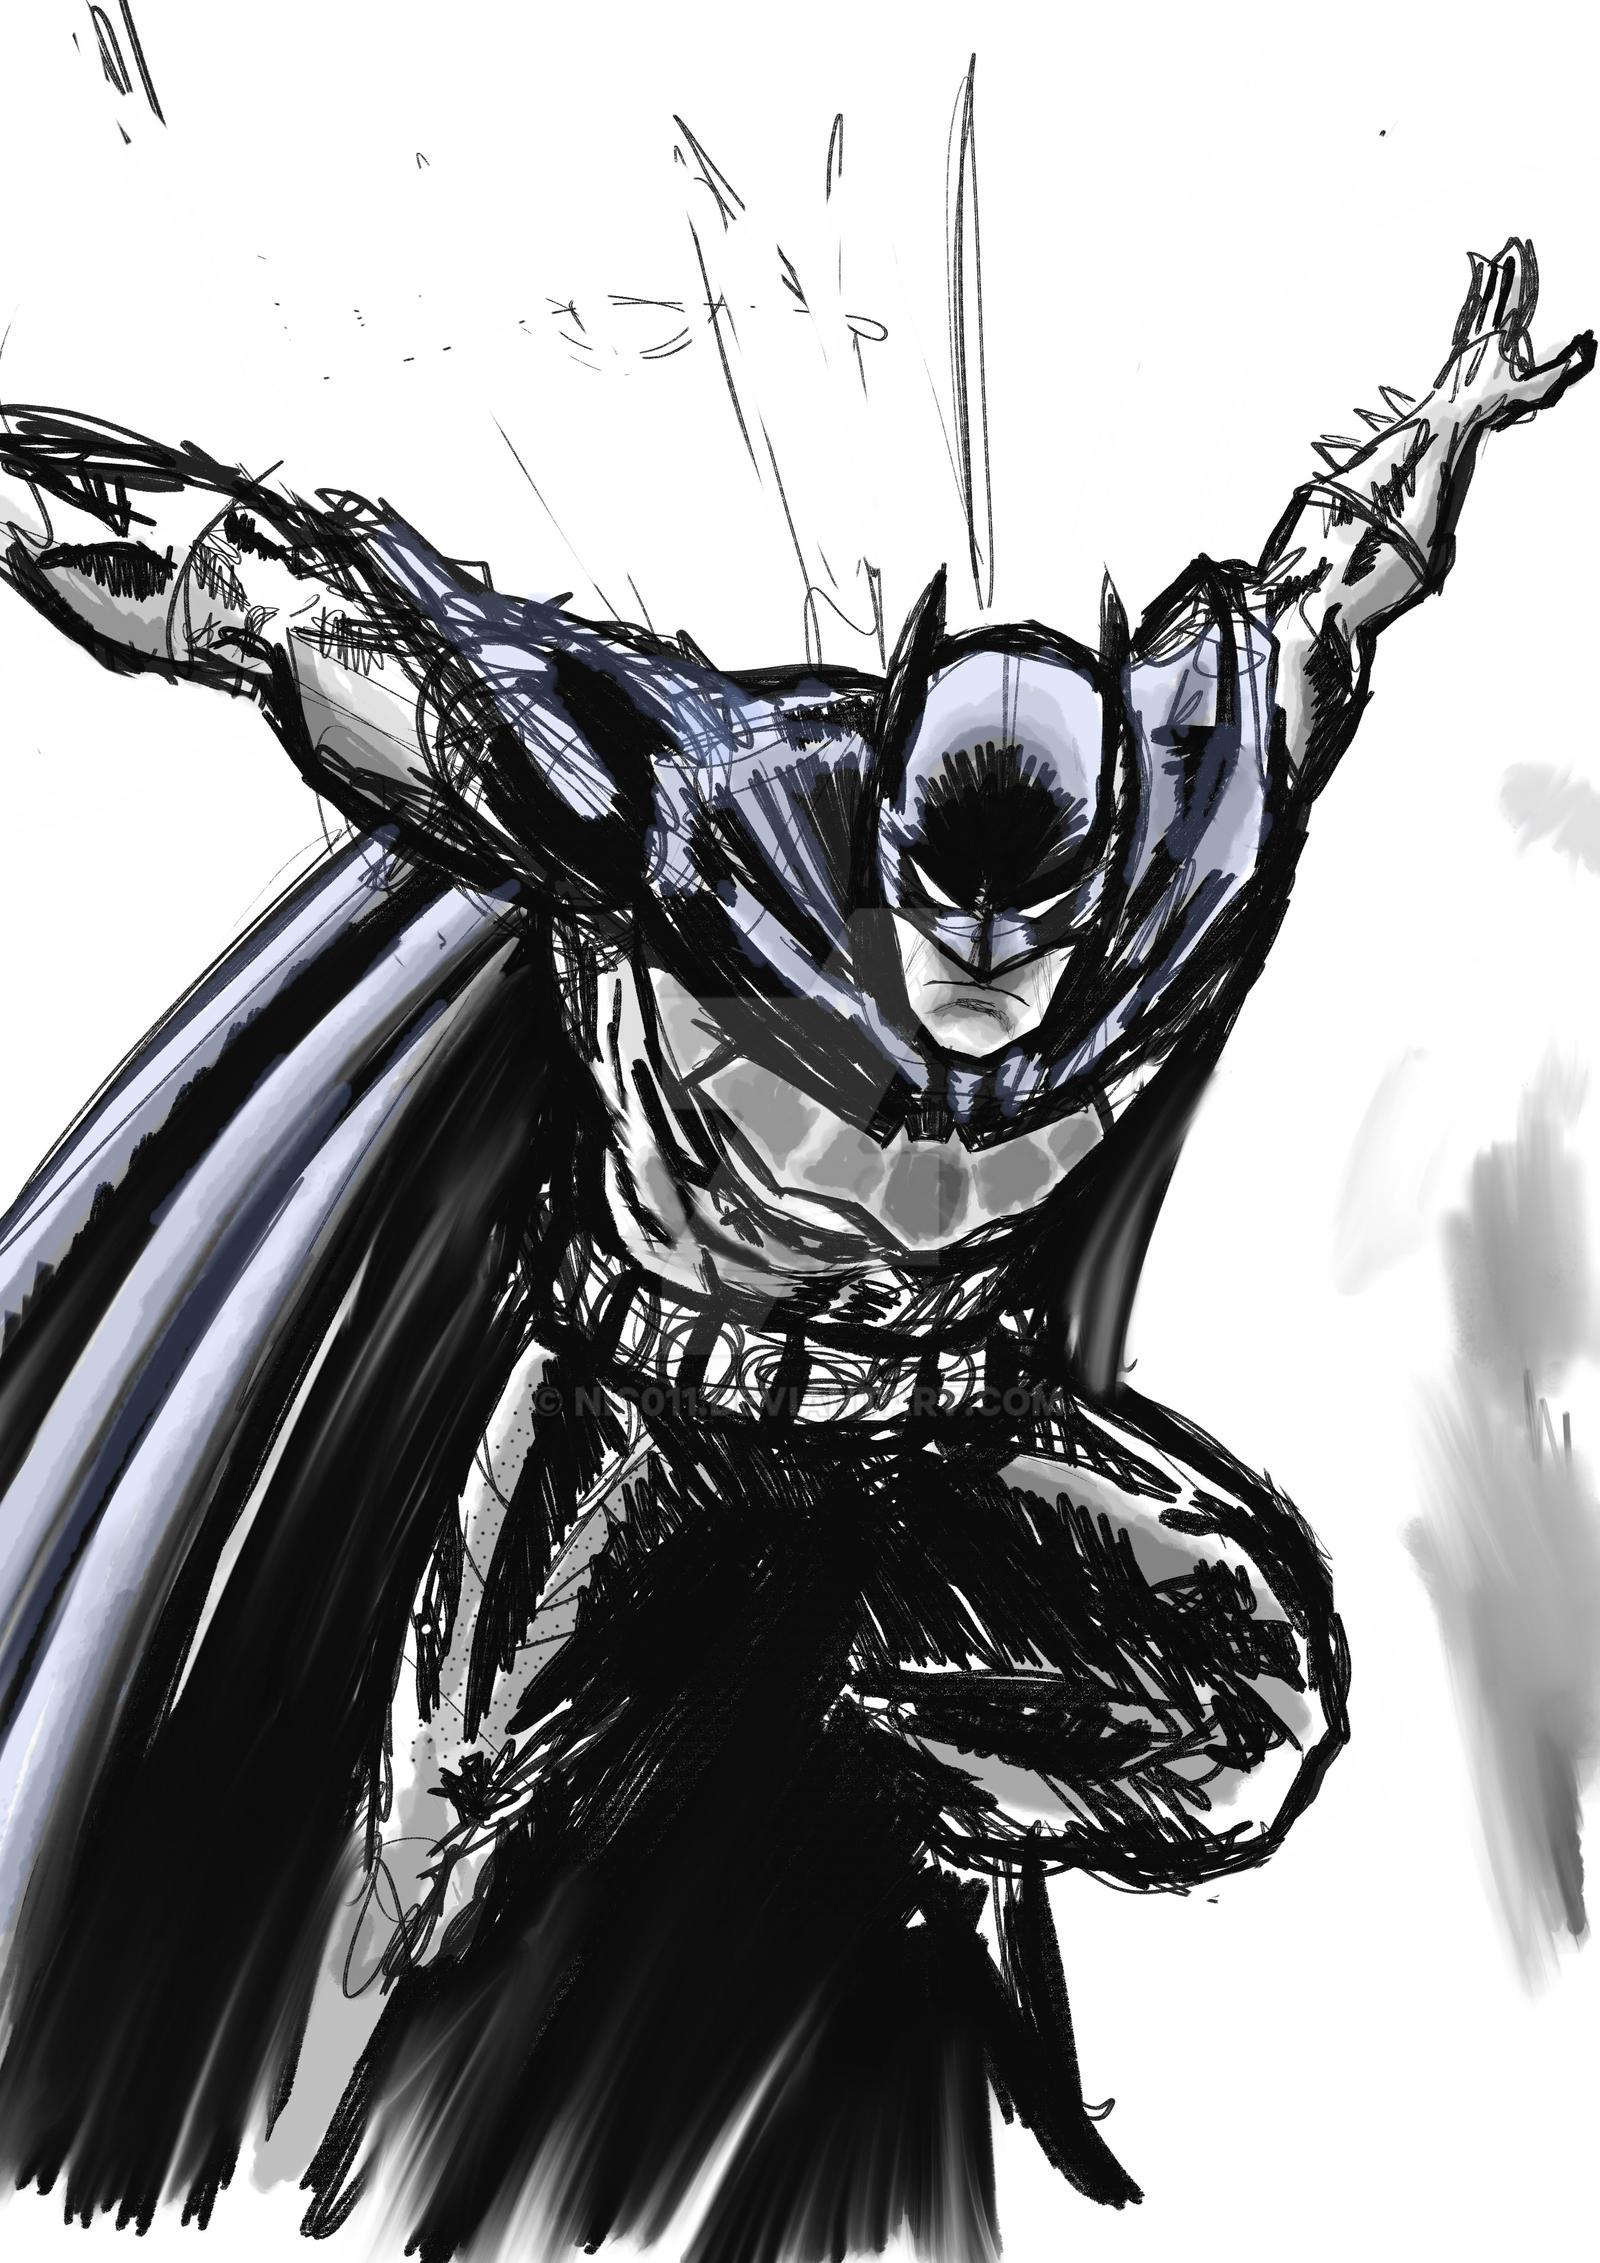 Bat by nic011